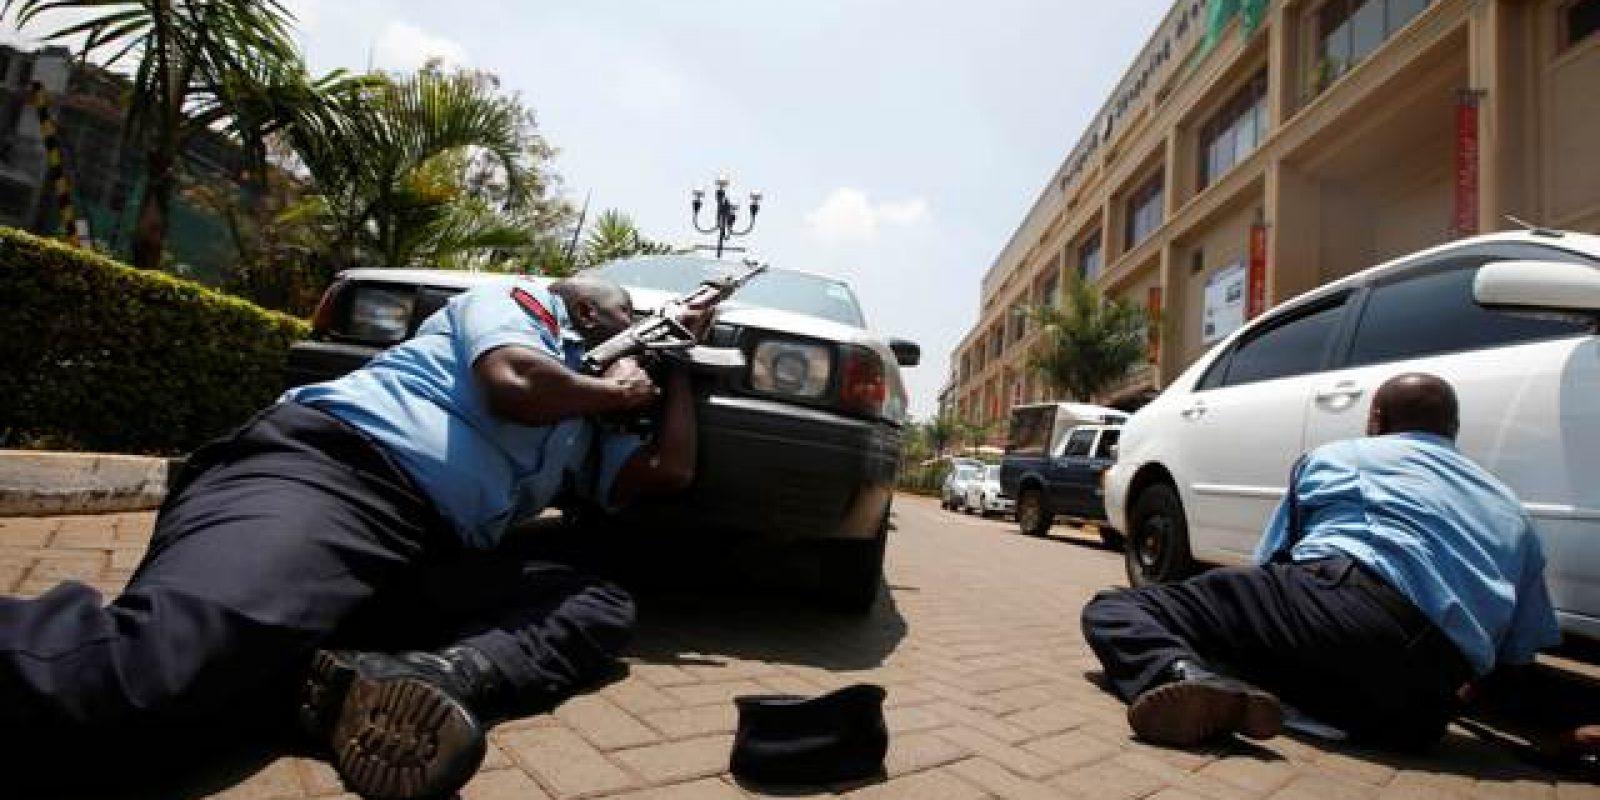 Reuters Goran Tomasevic Quênia1